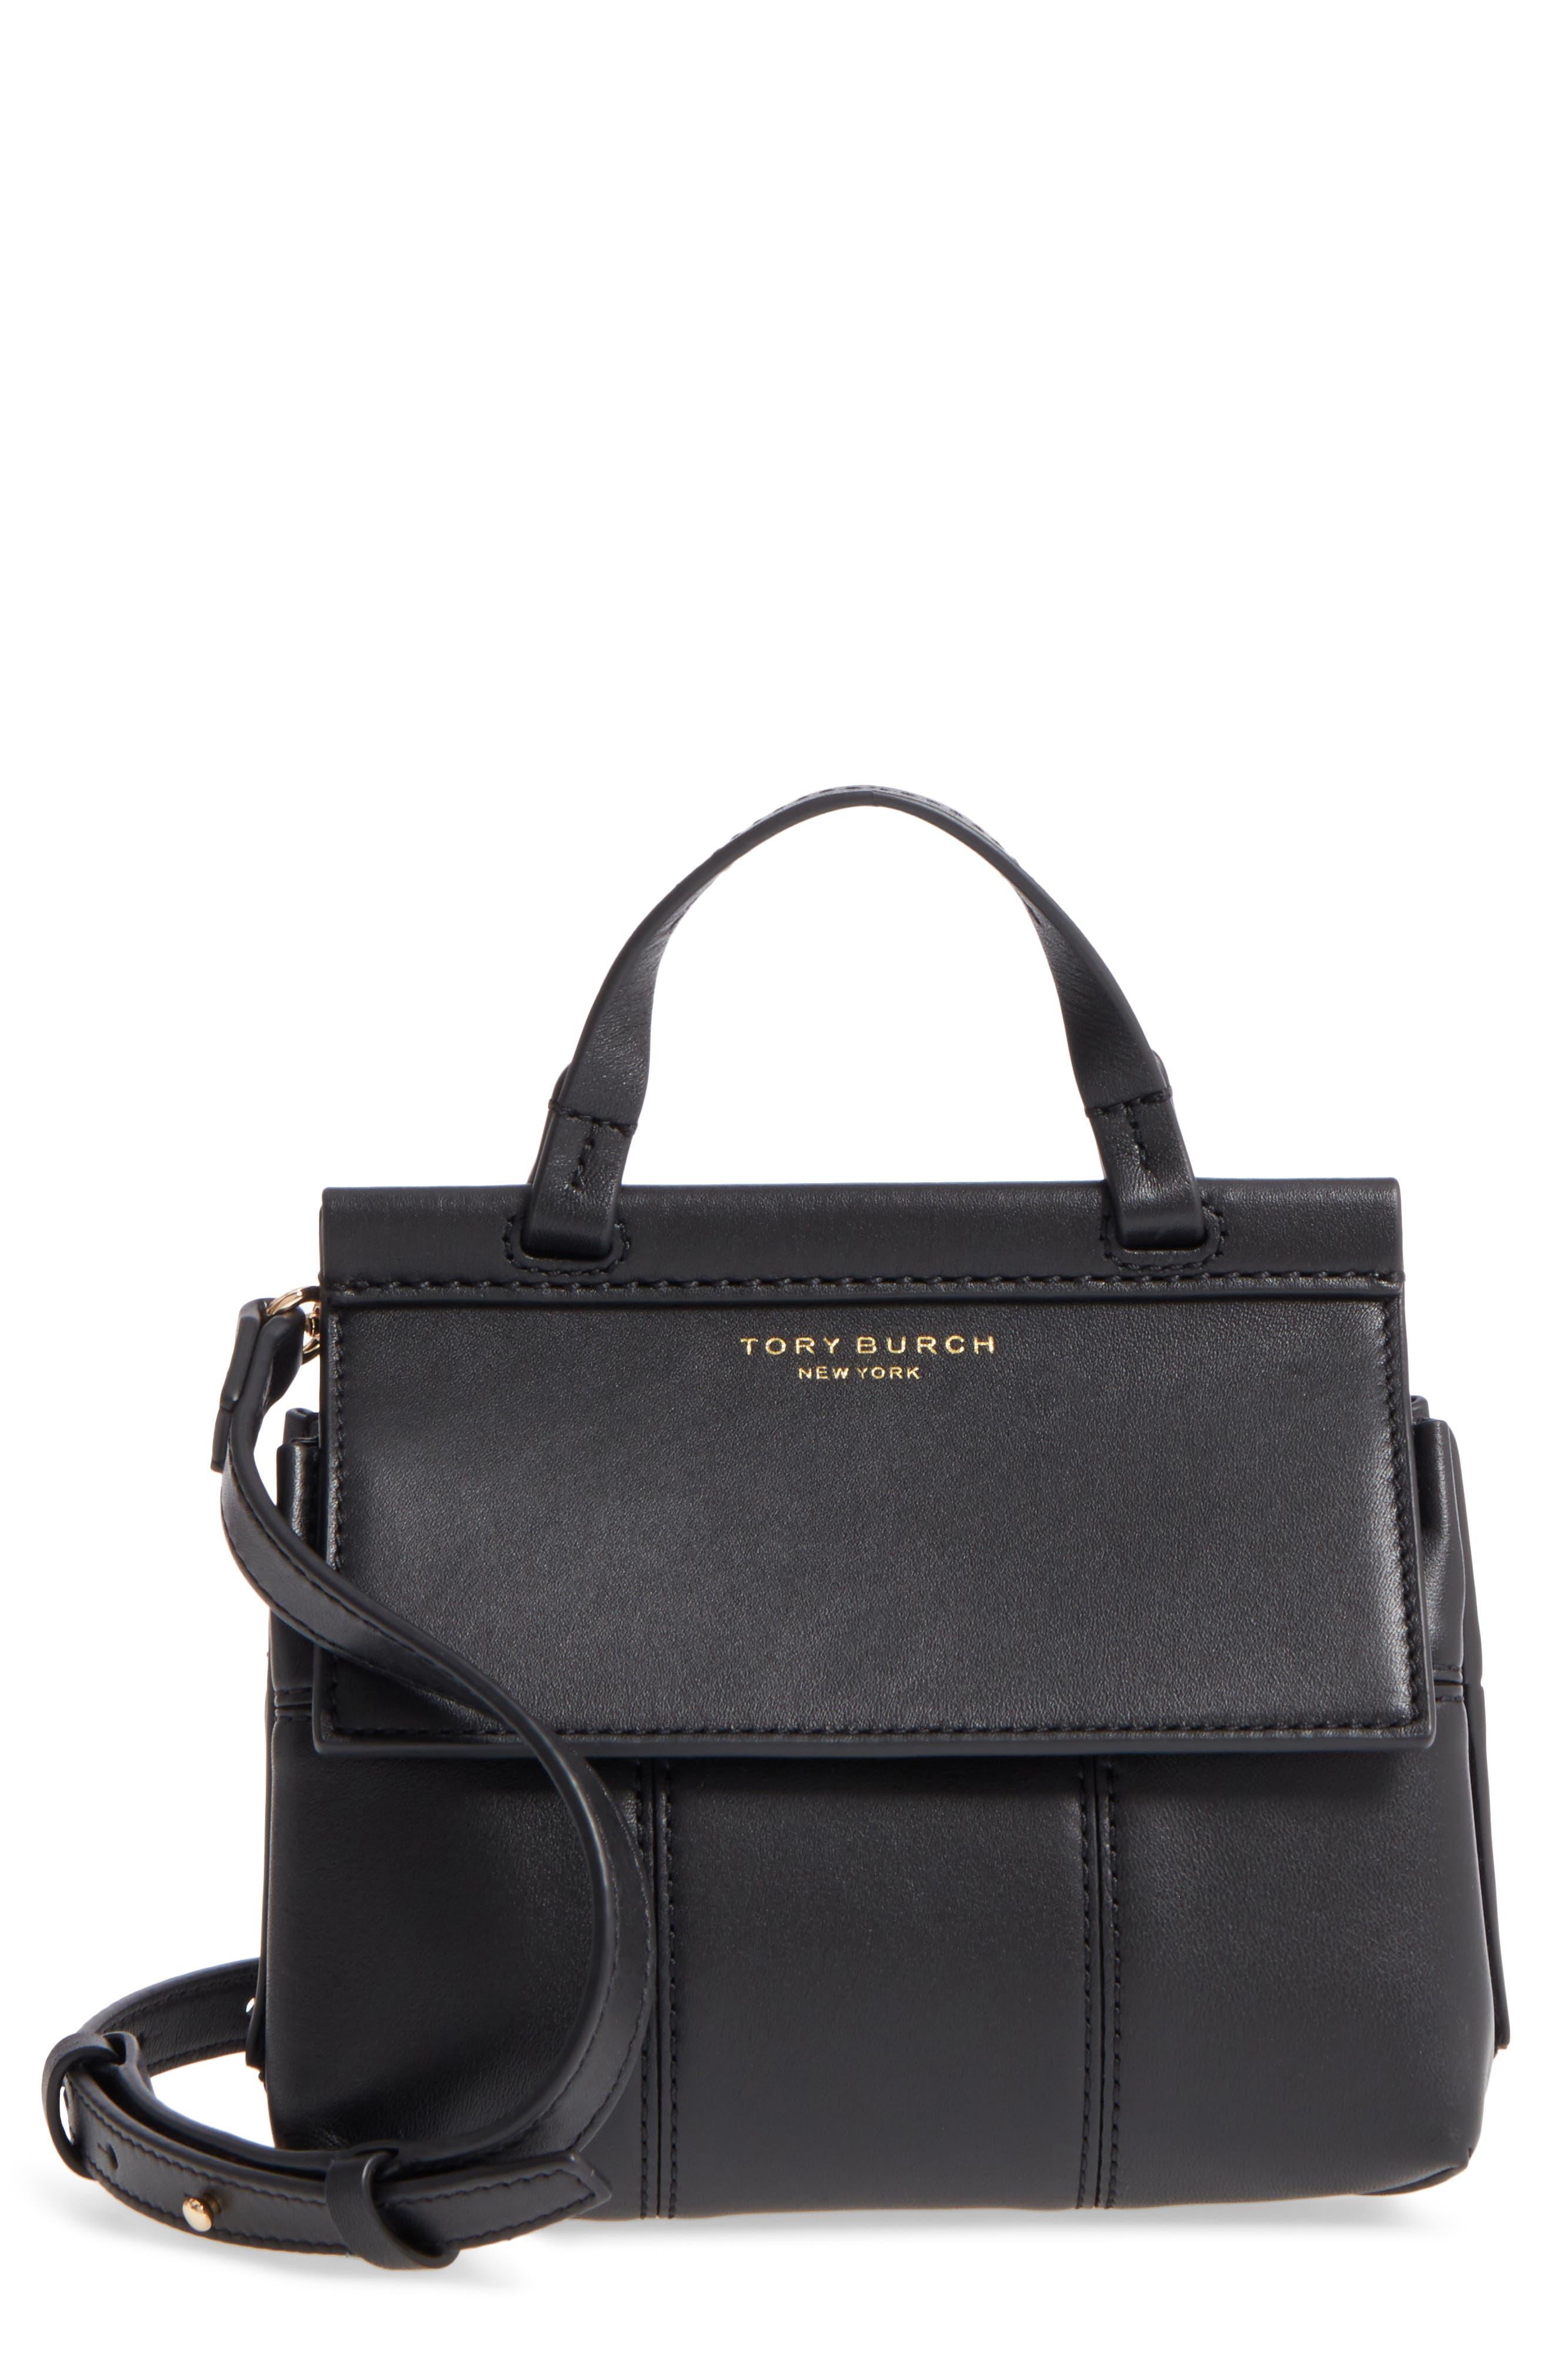 Tory Burch Mini Block-T Leather Satchel